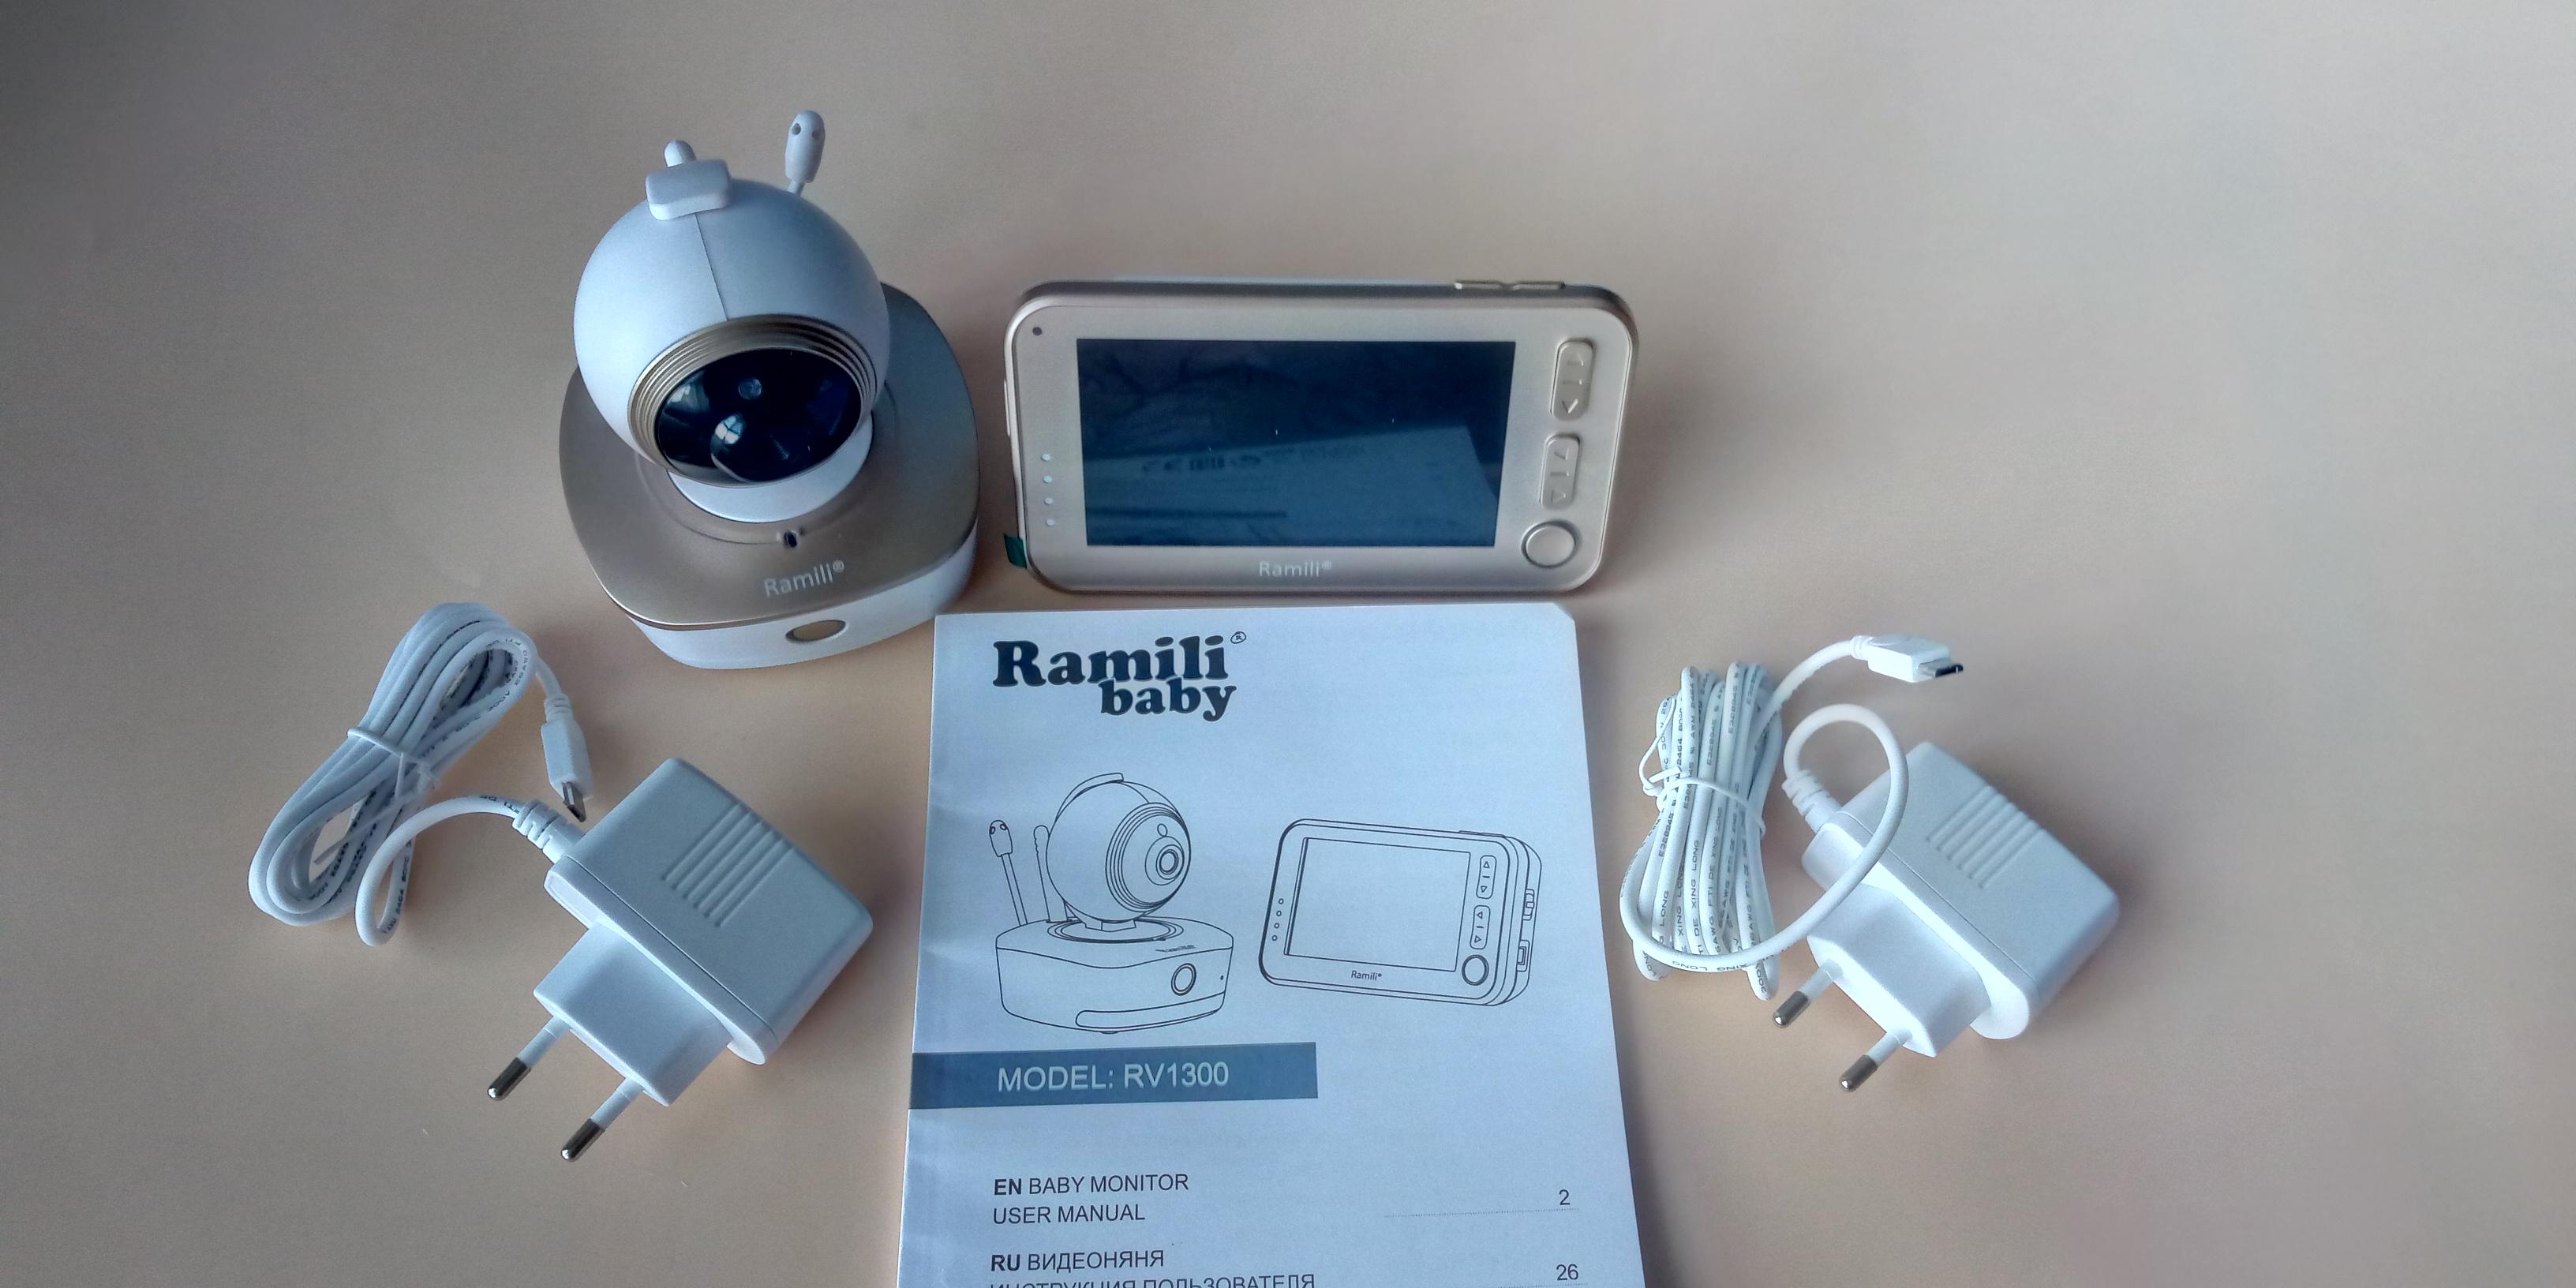 Комплектация видеоняни Ramili Baby RV1300